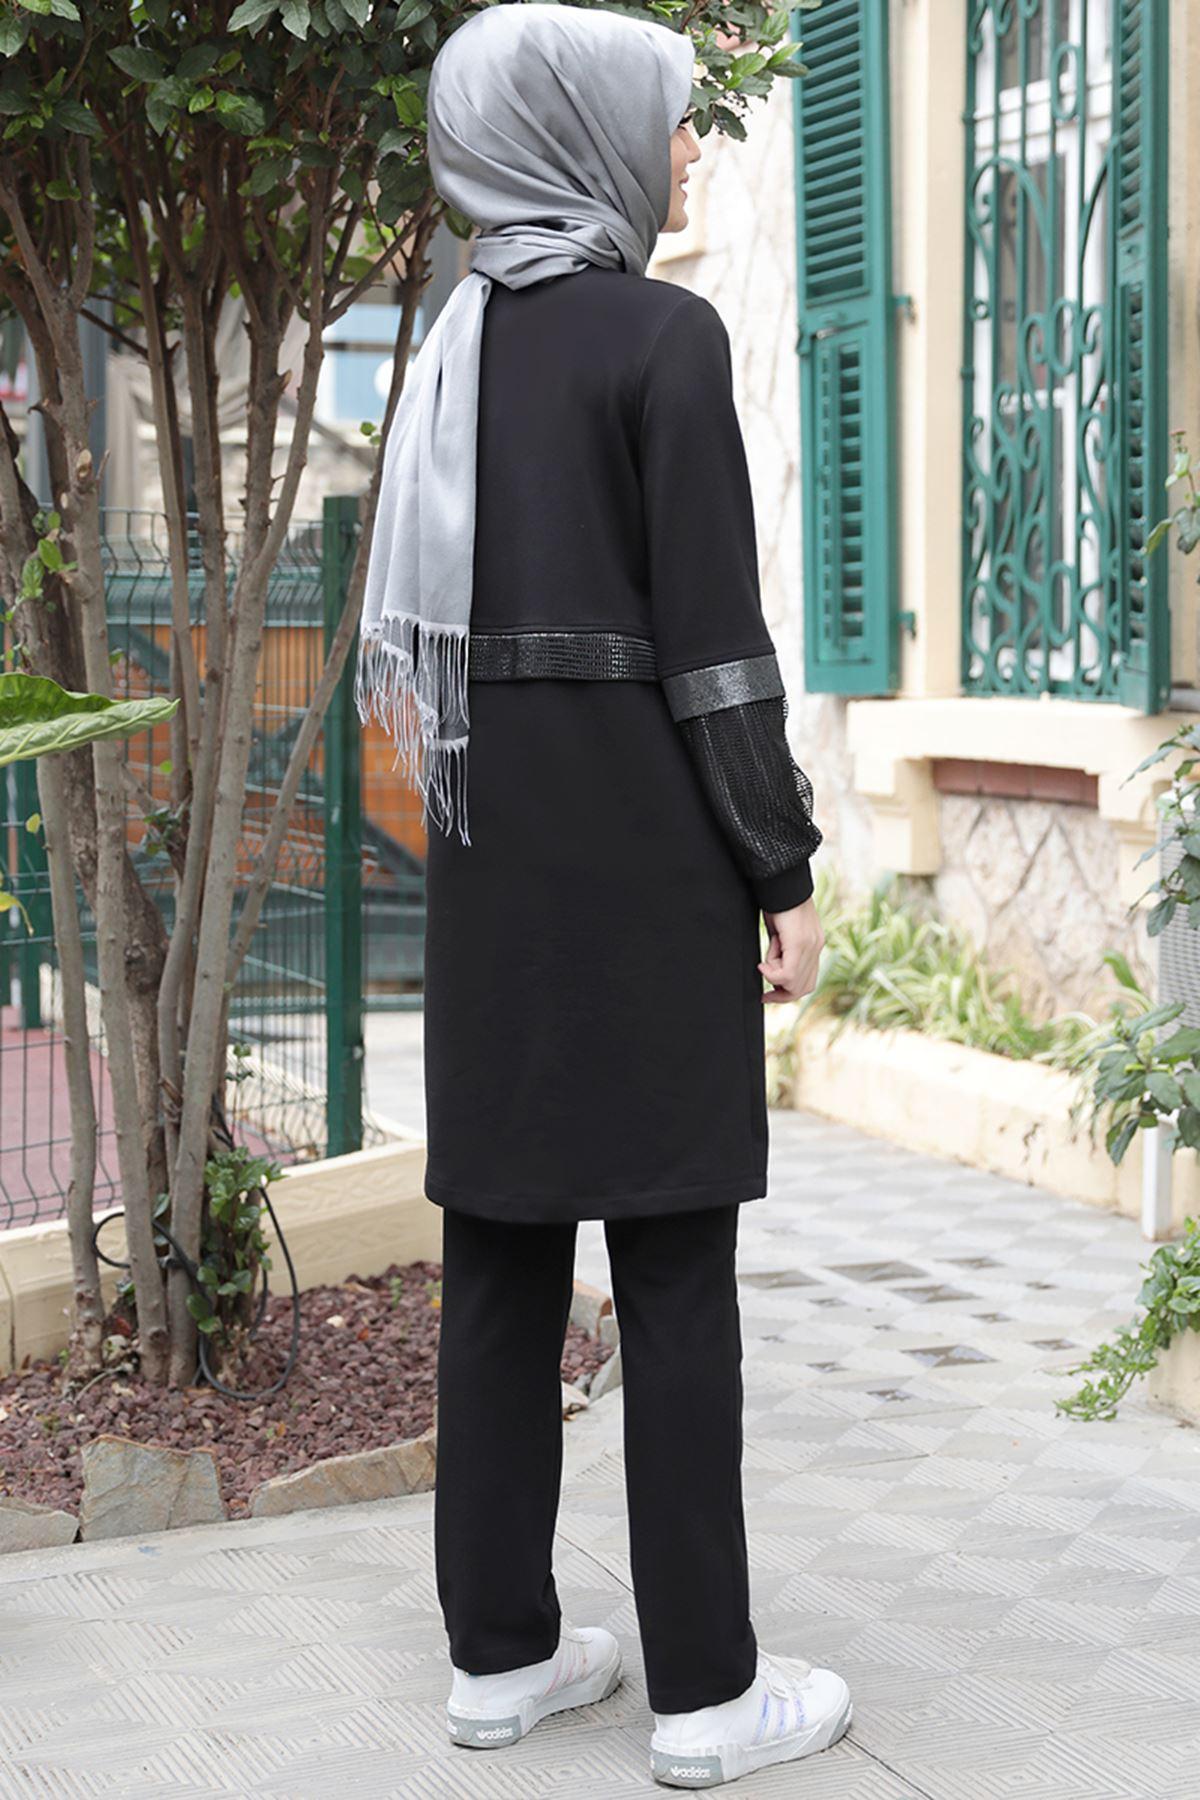 Emsale Zen İkili Takım Siyah EMS8325